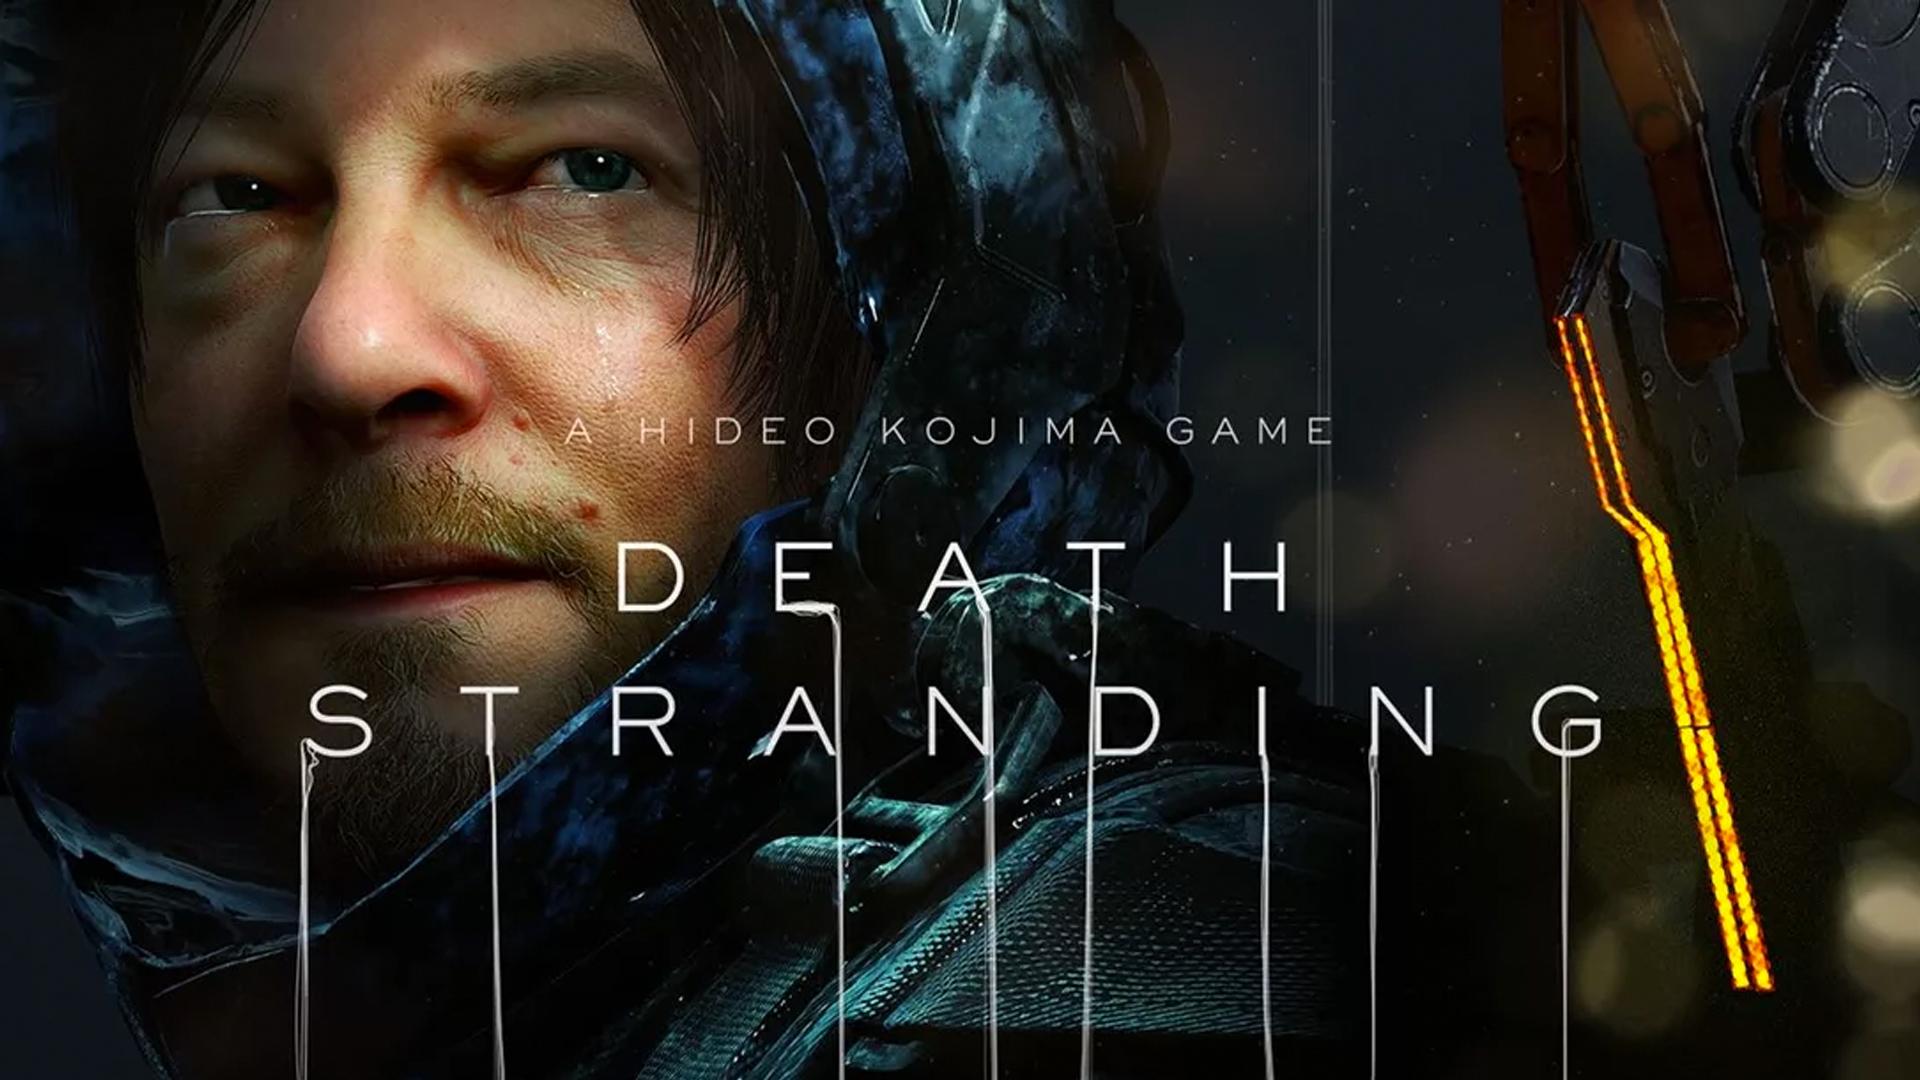 Death-stranding-ps4-video-game-artwork-localisation